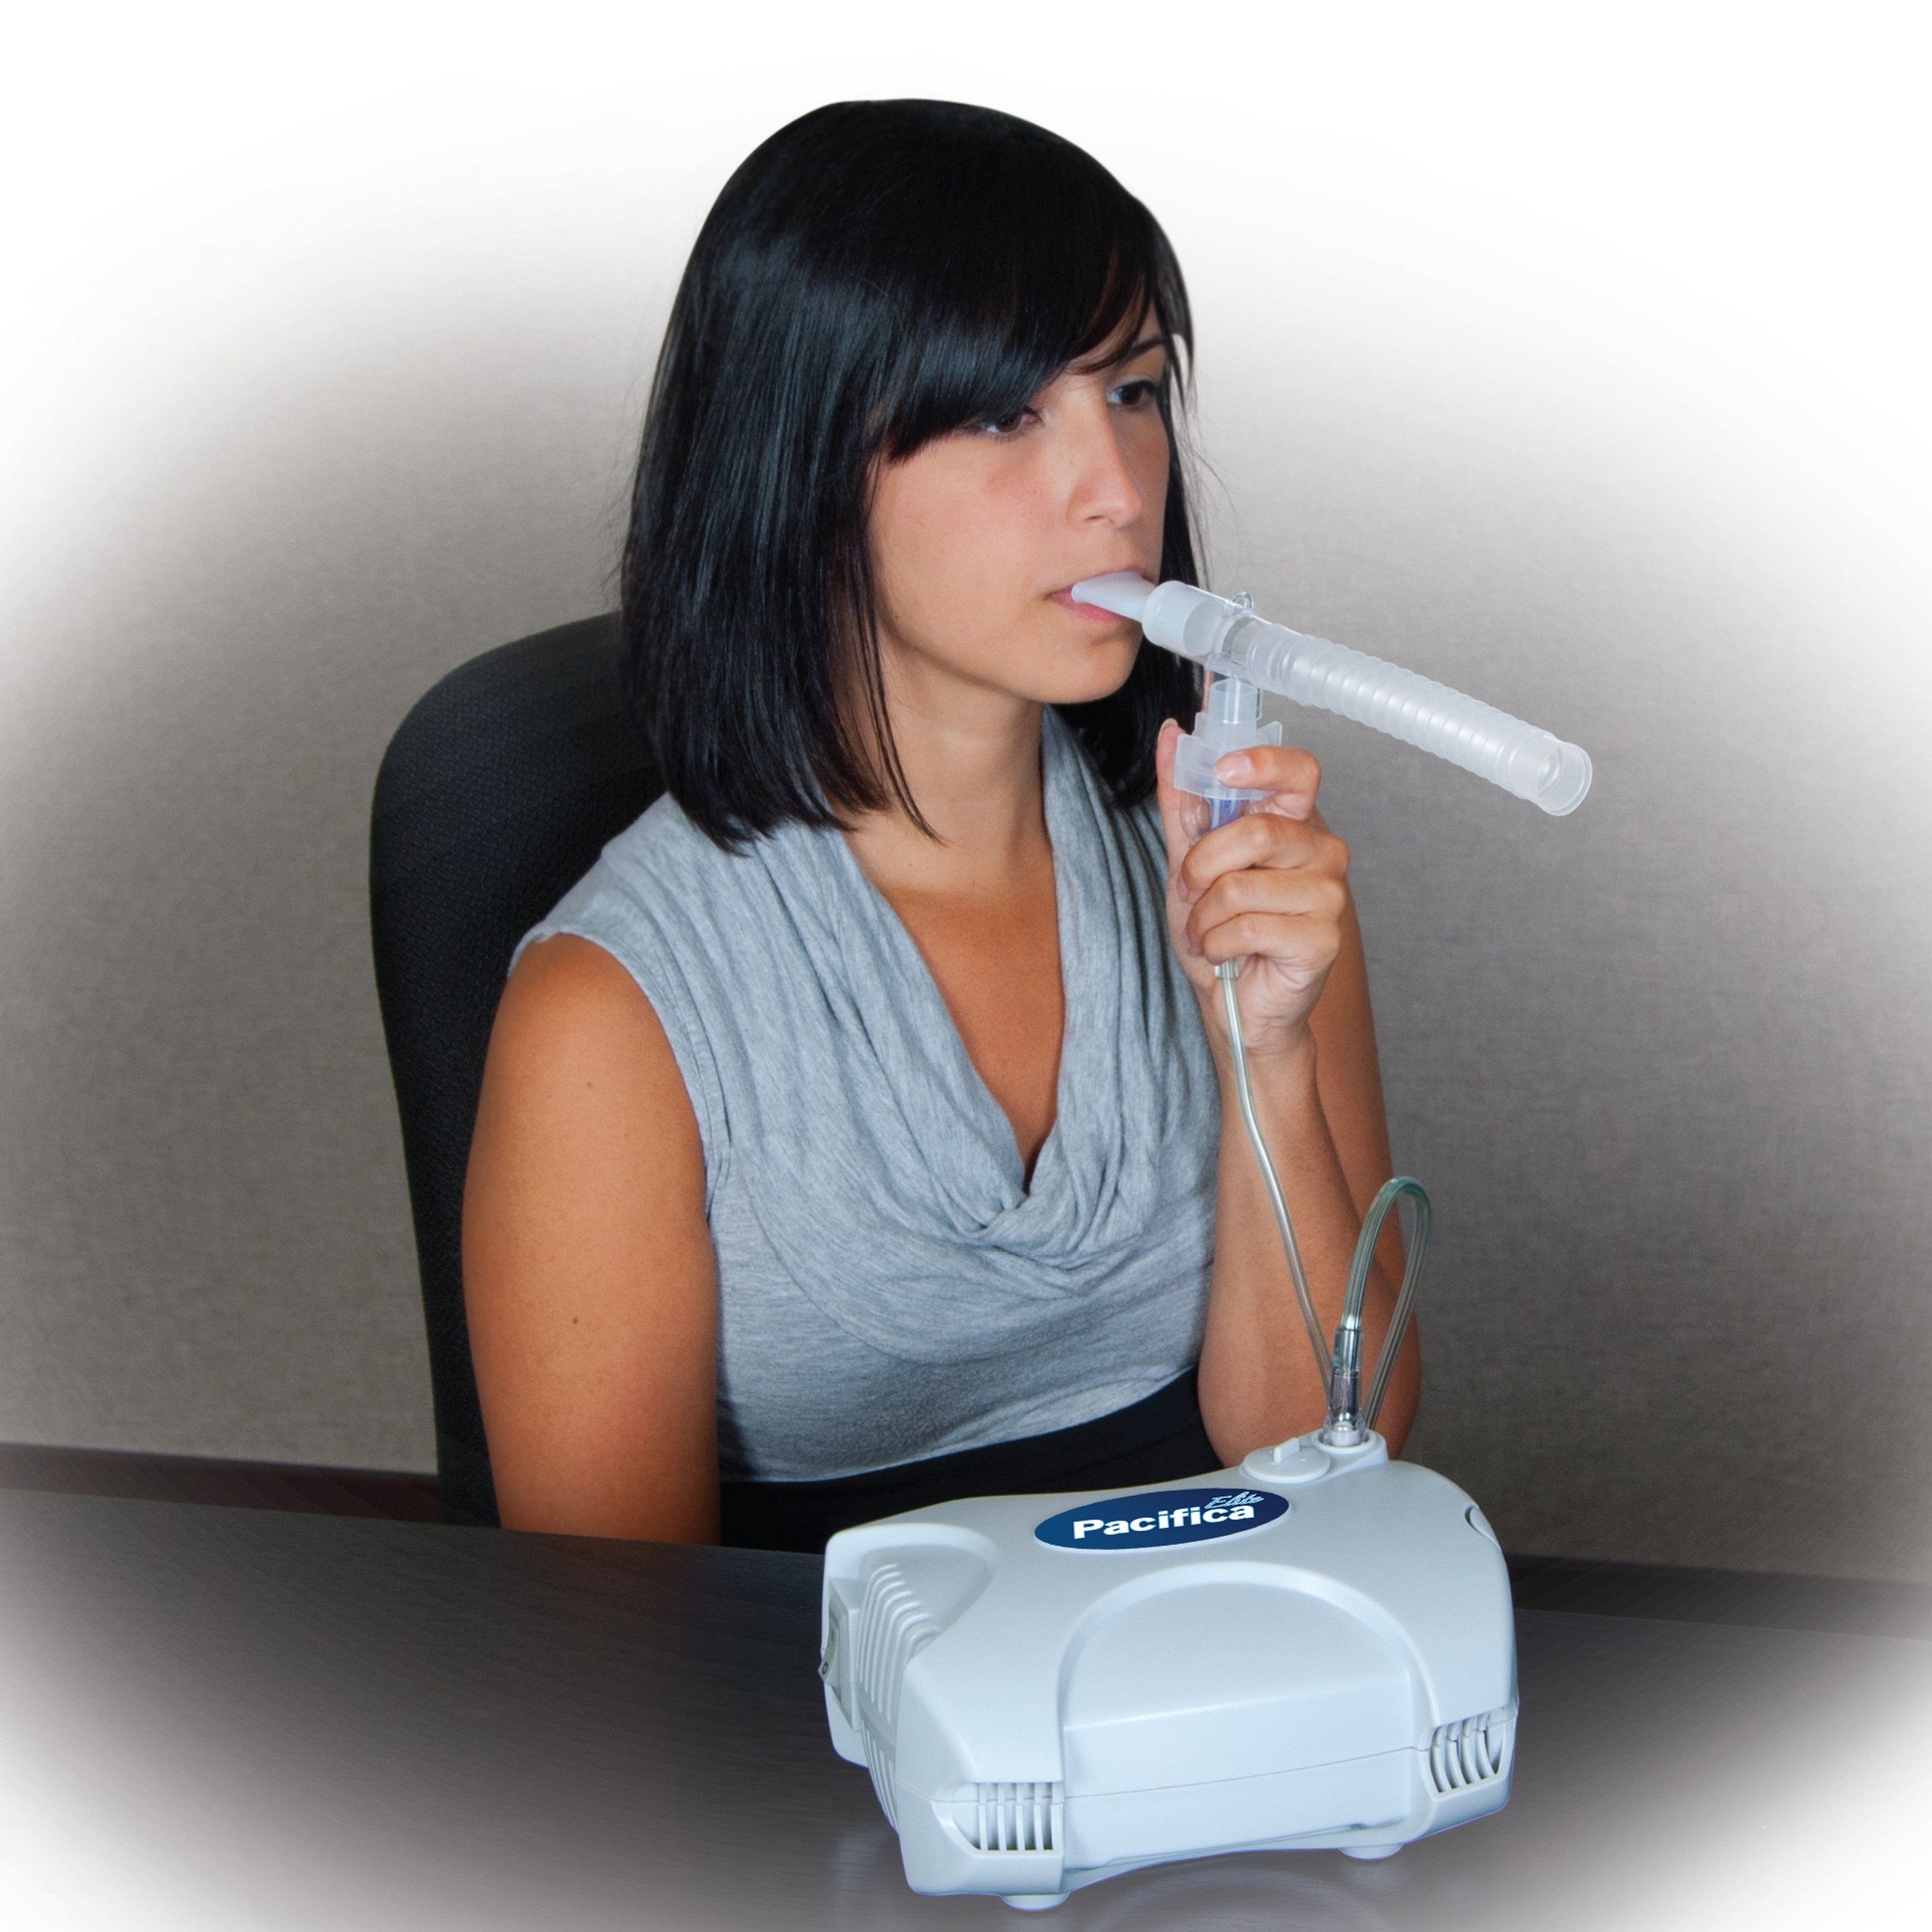 Drive Medical Pacifica Elite Nebulizer